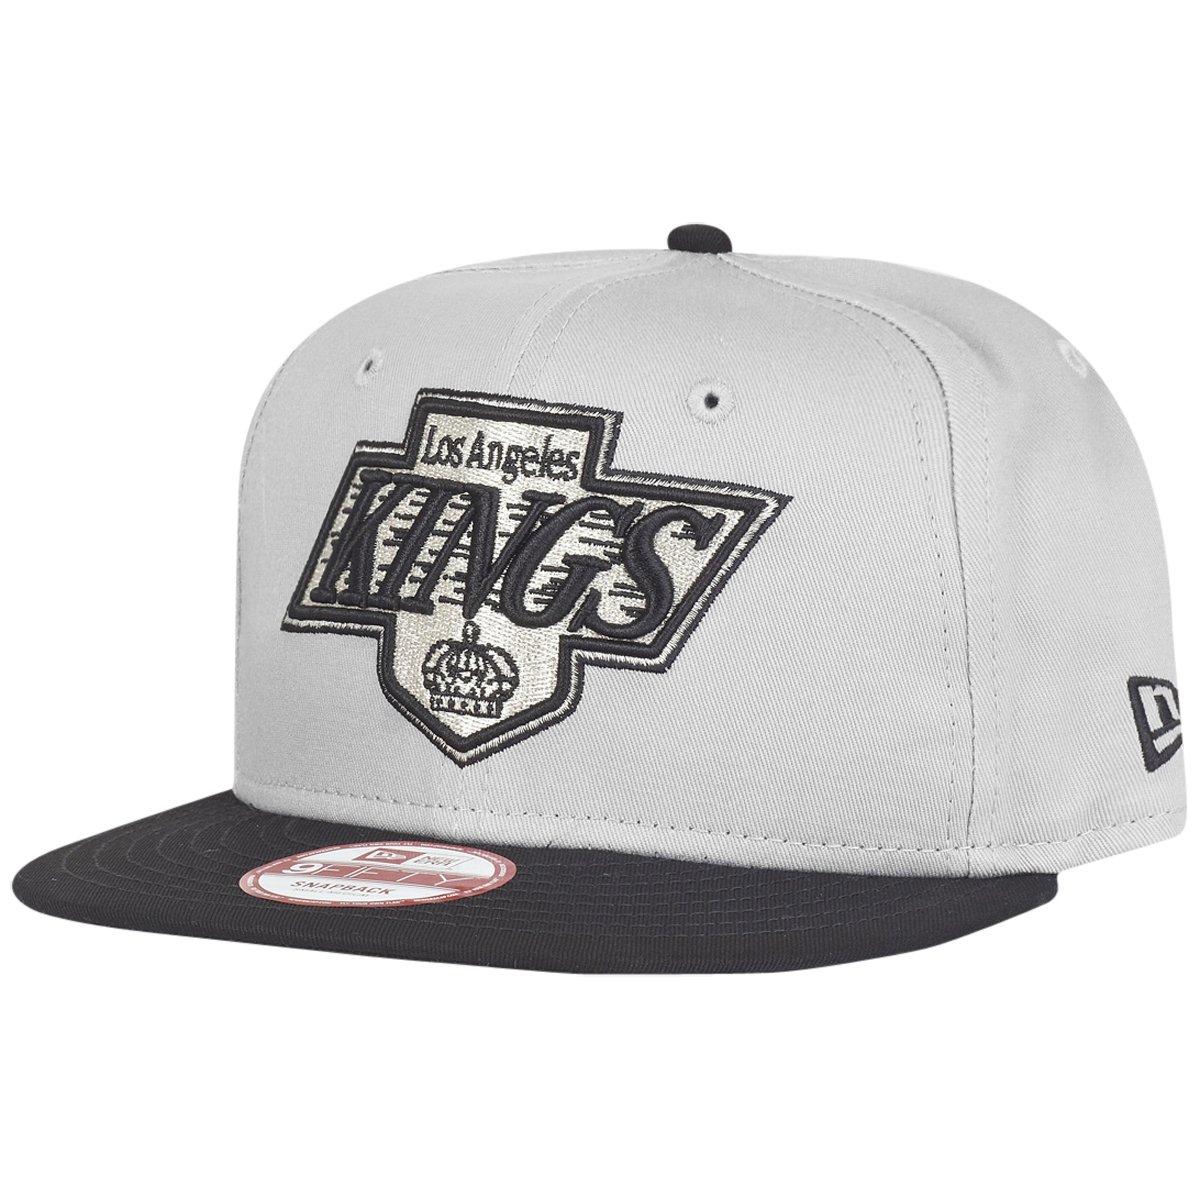 New Era 9Fifty Snapback Cap - LOS ANGELES Kings grau - S/M | eBay